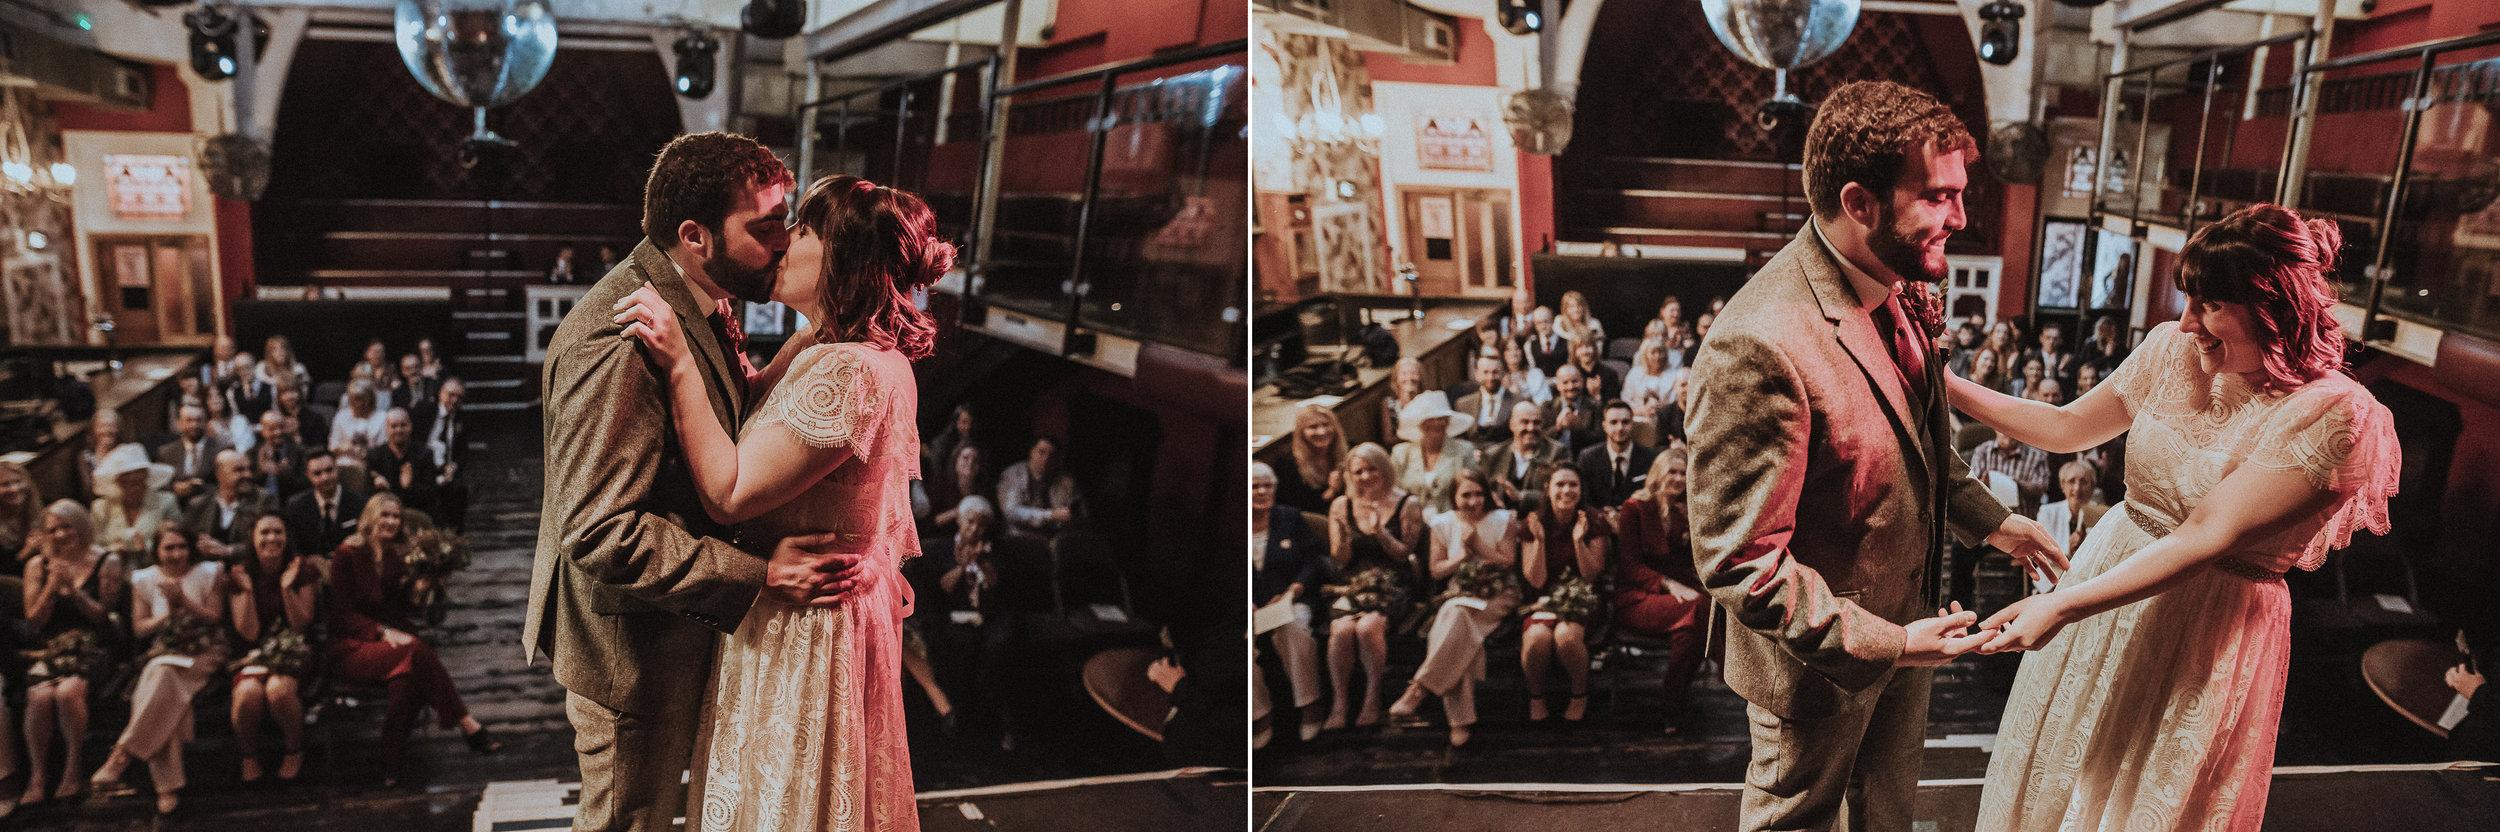 Manchester_Alternative_Wedding_Photographer-35.jpg